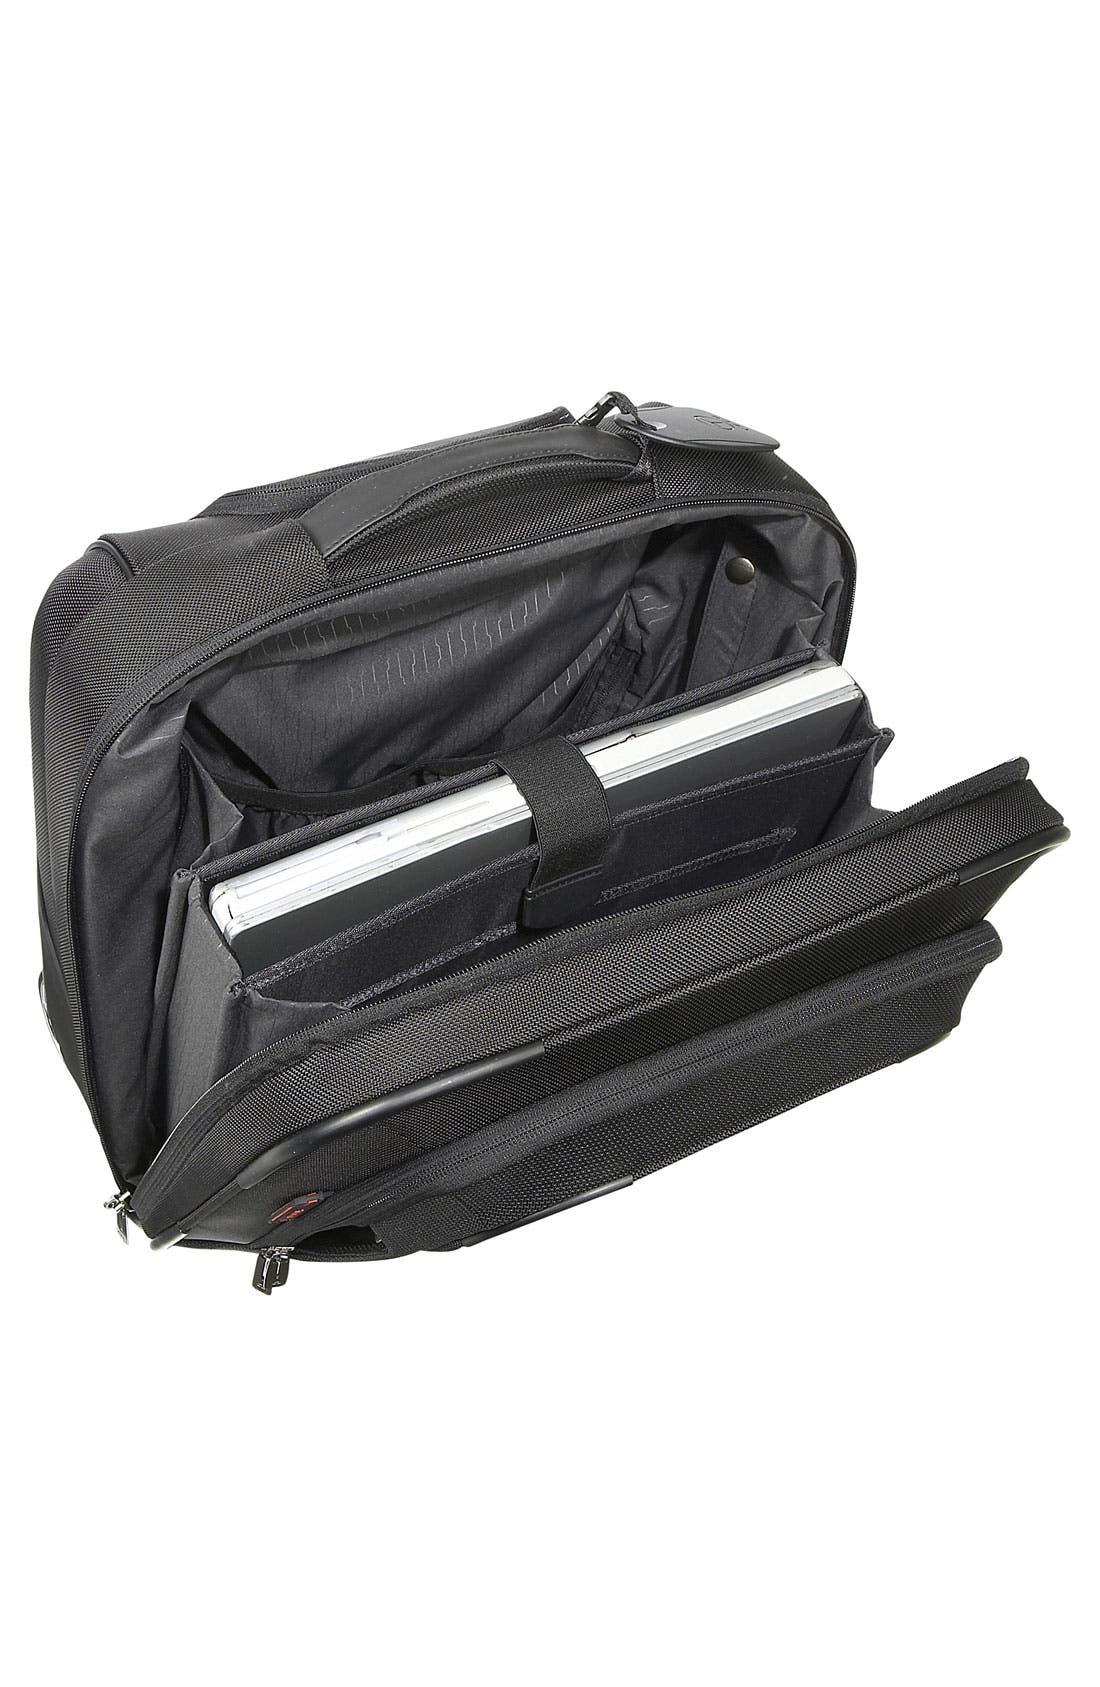 Alternate Image 3  - T-Tech by Tumi 'Presidio MacArthur' Wheeled Compact Laptop Briefcase